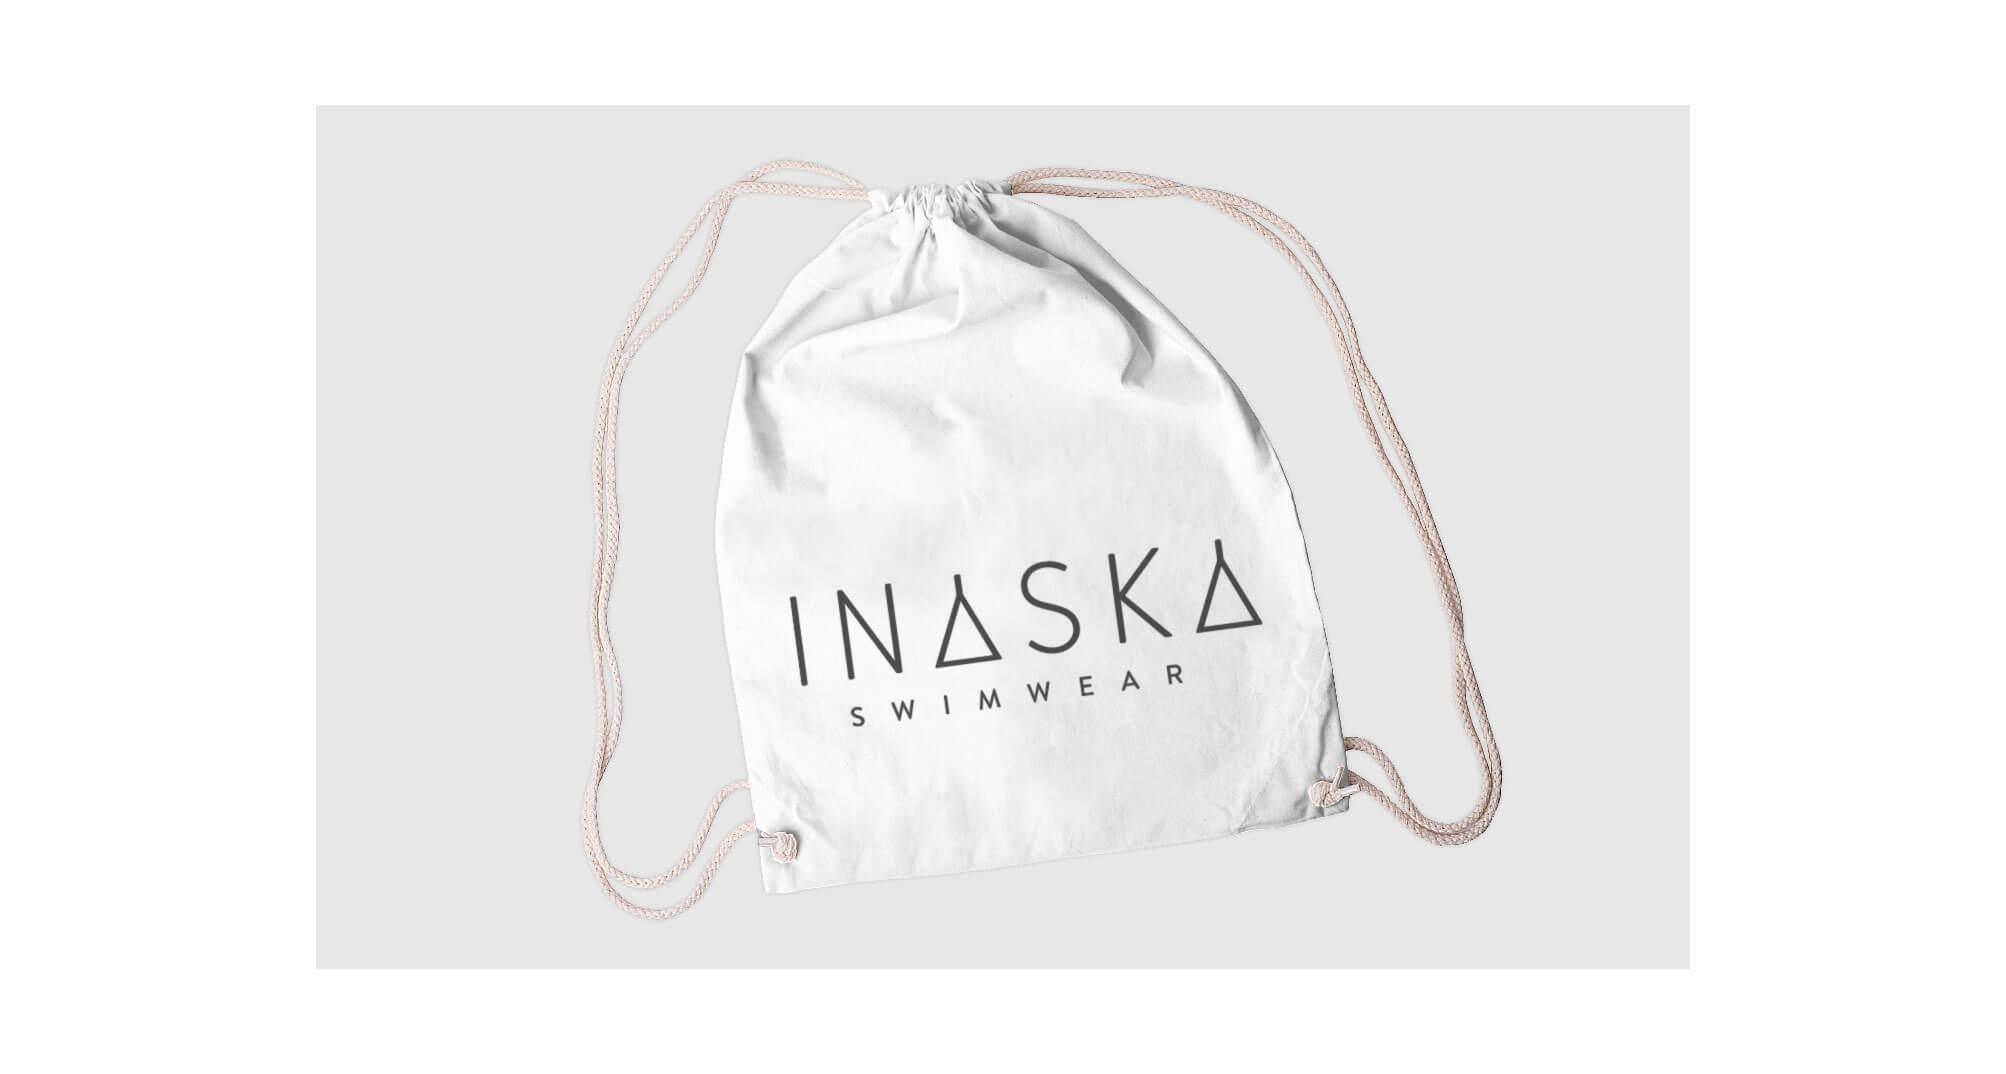 360VIER_Inaska_Case-Study_Slider-06 Inaska Swimwear